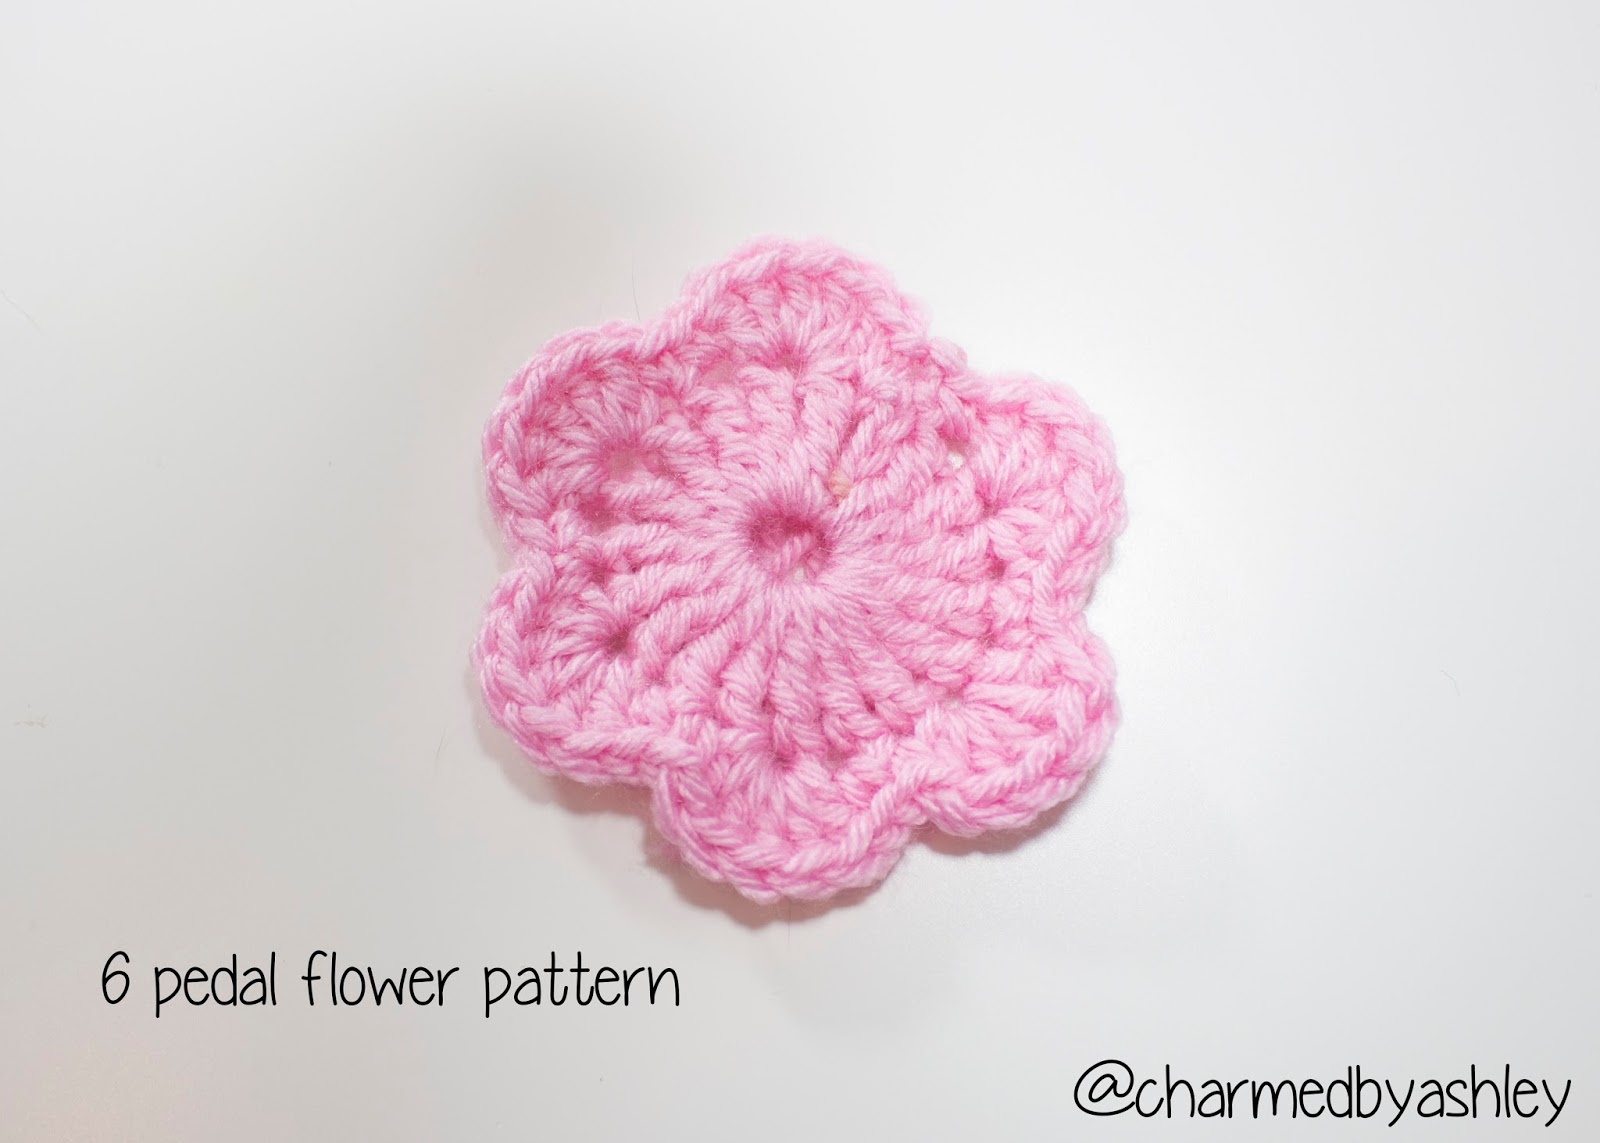 🌸🌼🌻 3 Crochet Flowers 🌸🌼🌻 - Charmed By Ashley